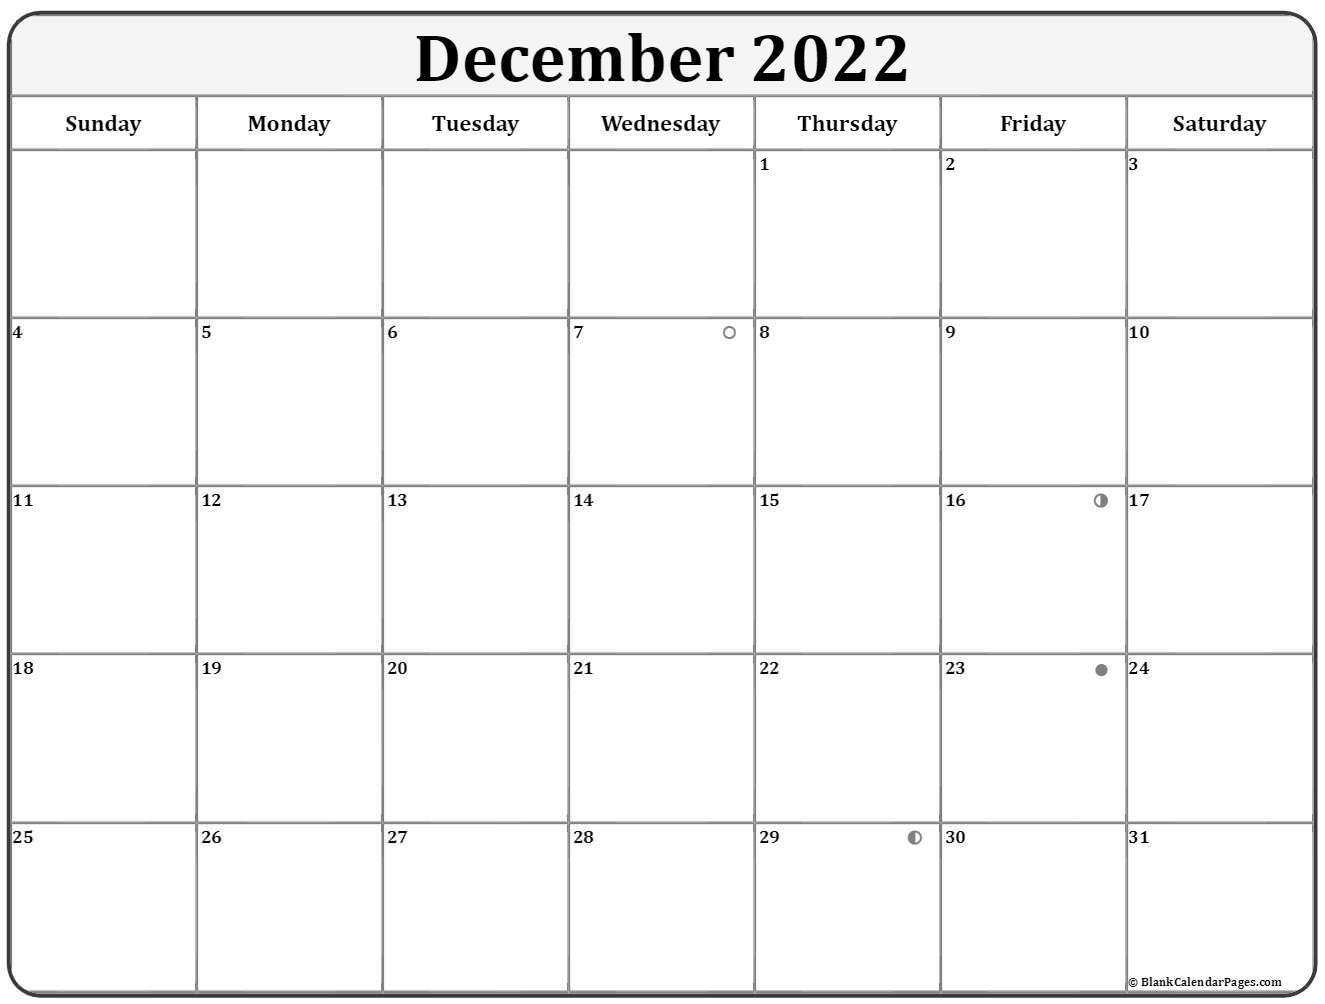 December 2020 moon phase calendar. lunar calendar